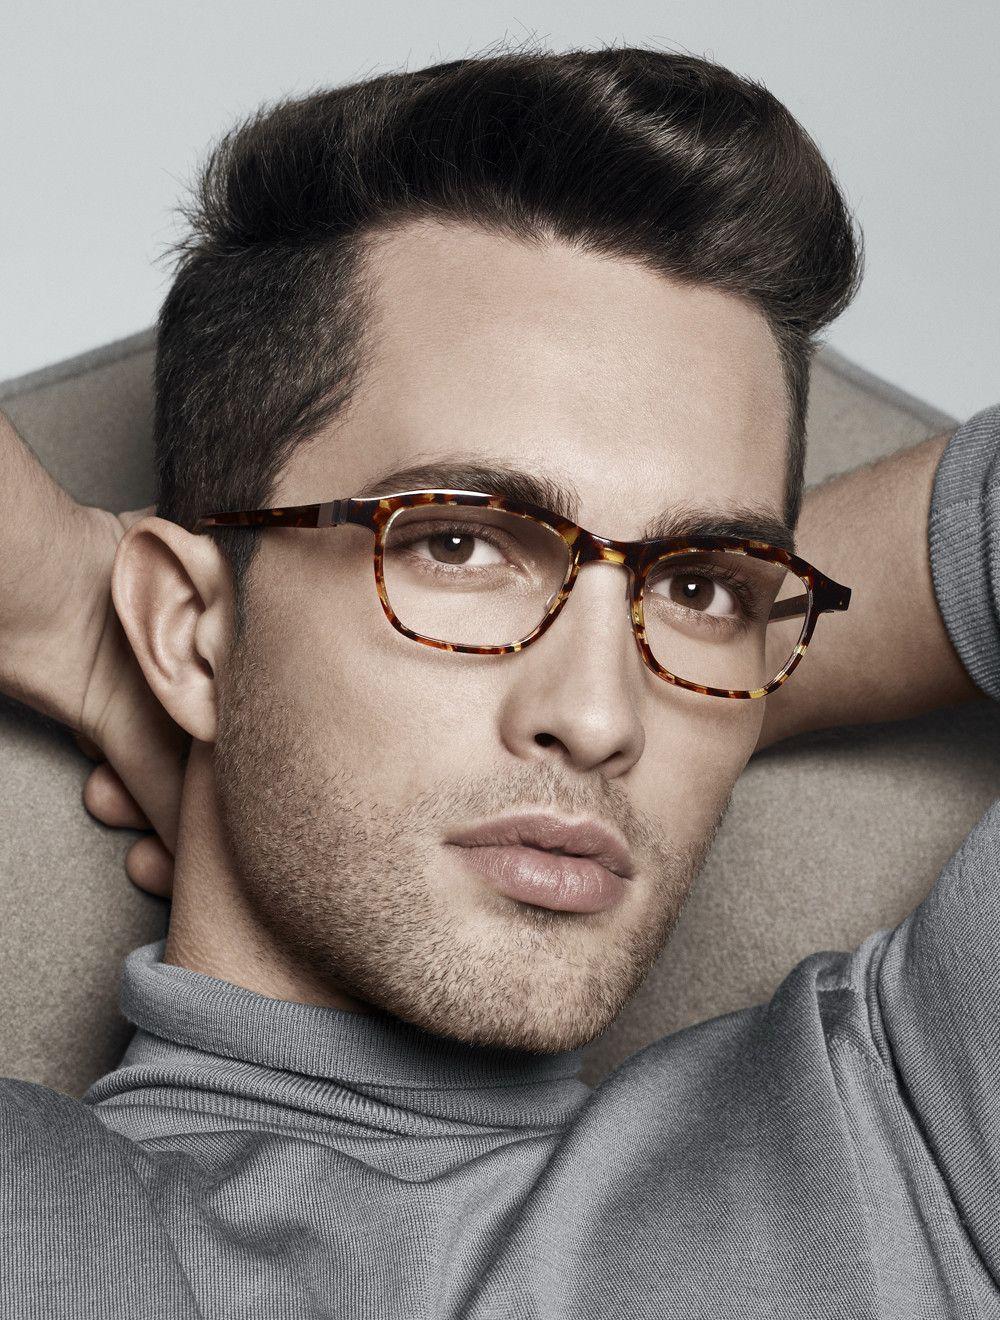 431e702a701 LINDBERG Acetanium 1232 Wearing Glasses